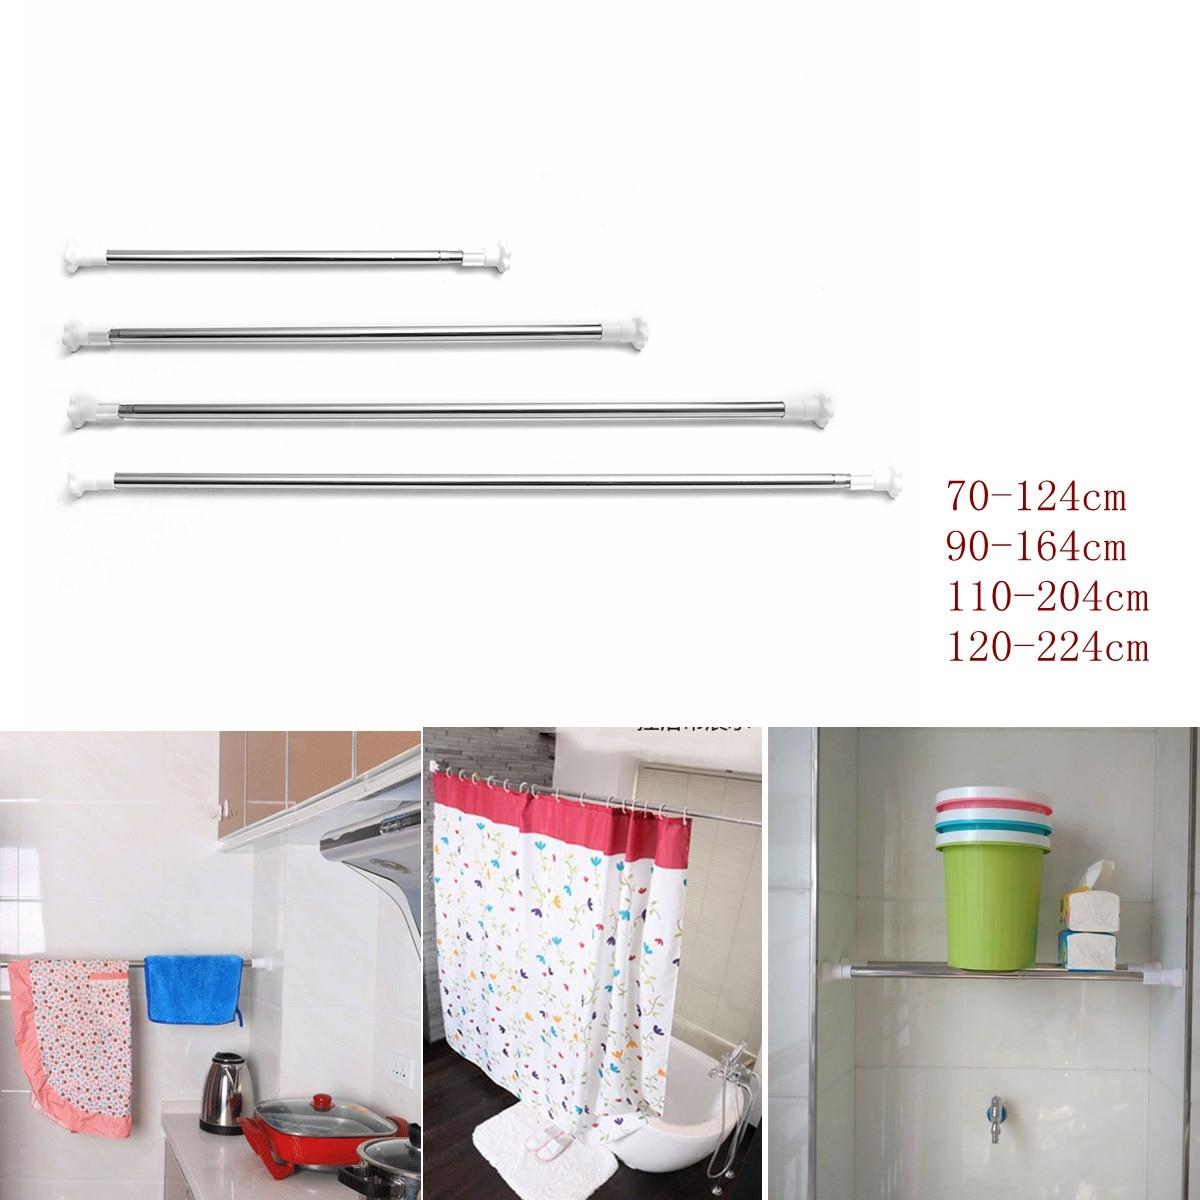 Adjustable Steel Rods Rails Bars Steel Telescopic Extendable Wardrobe Windows Bath Shower Curtain Rail Rod Pole beautiful winter river and trees print bath decor shower curtain